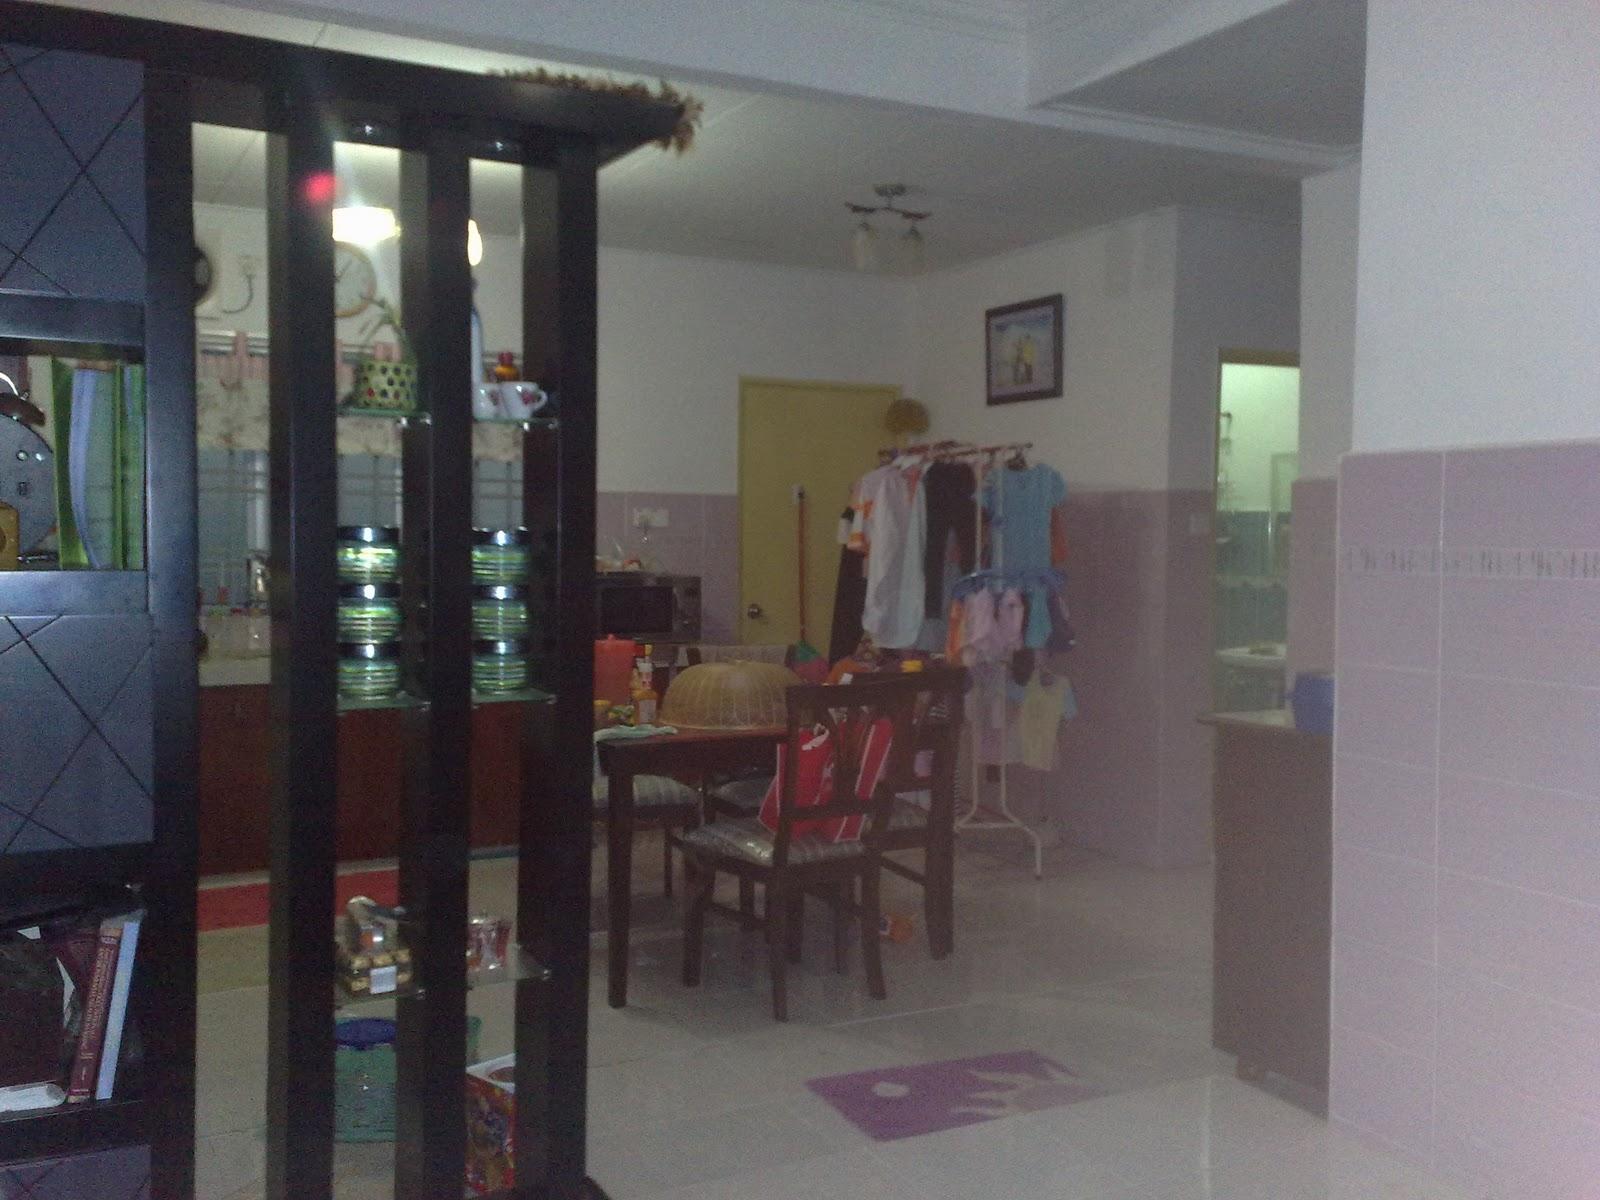 Double Storey House For SALE, 20x70 Taman Puncak Jalil (56 PHOTOS)